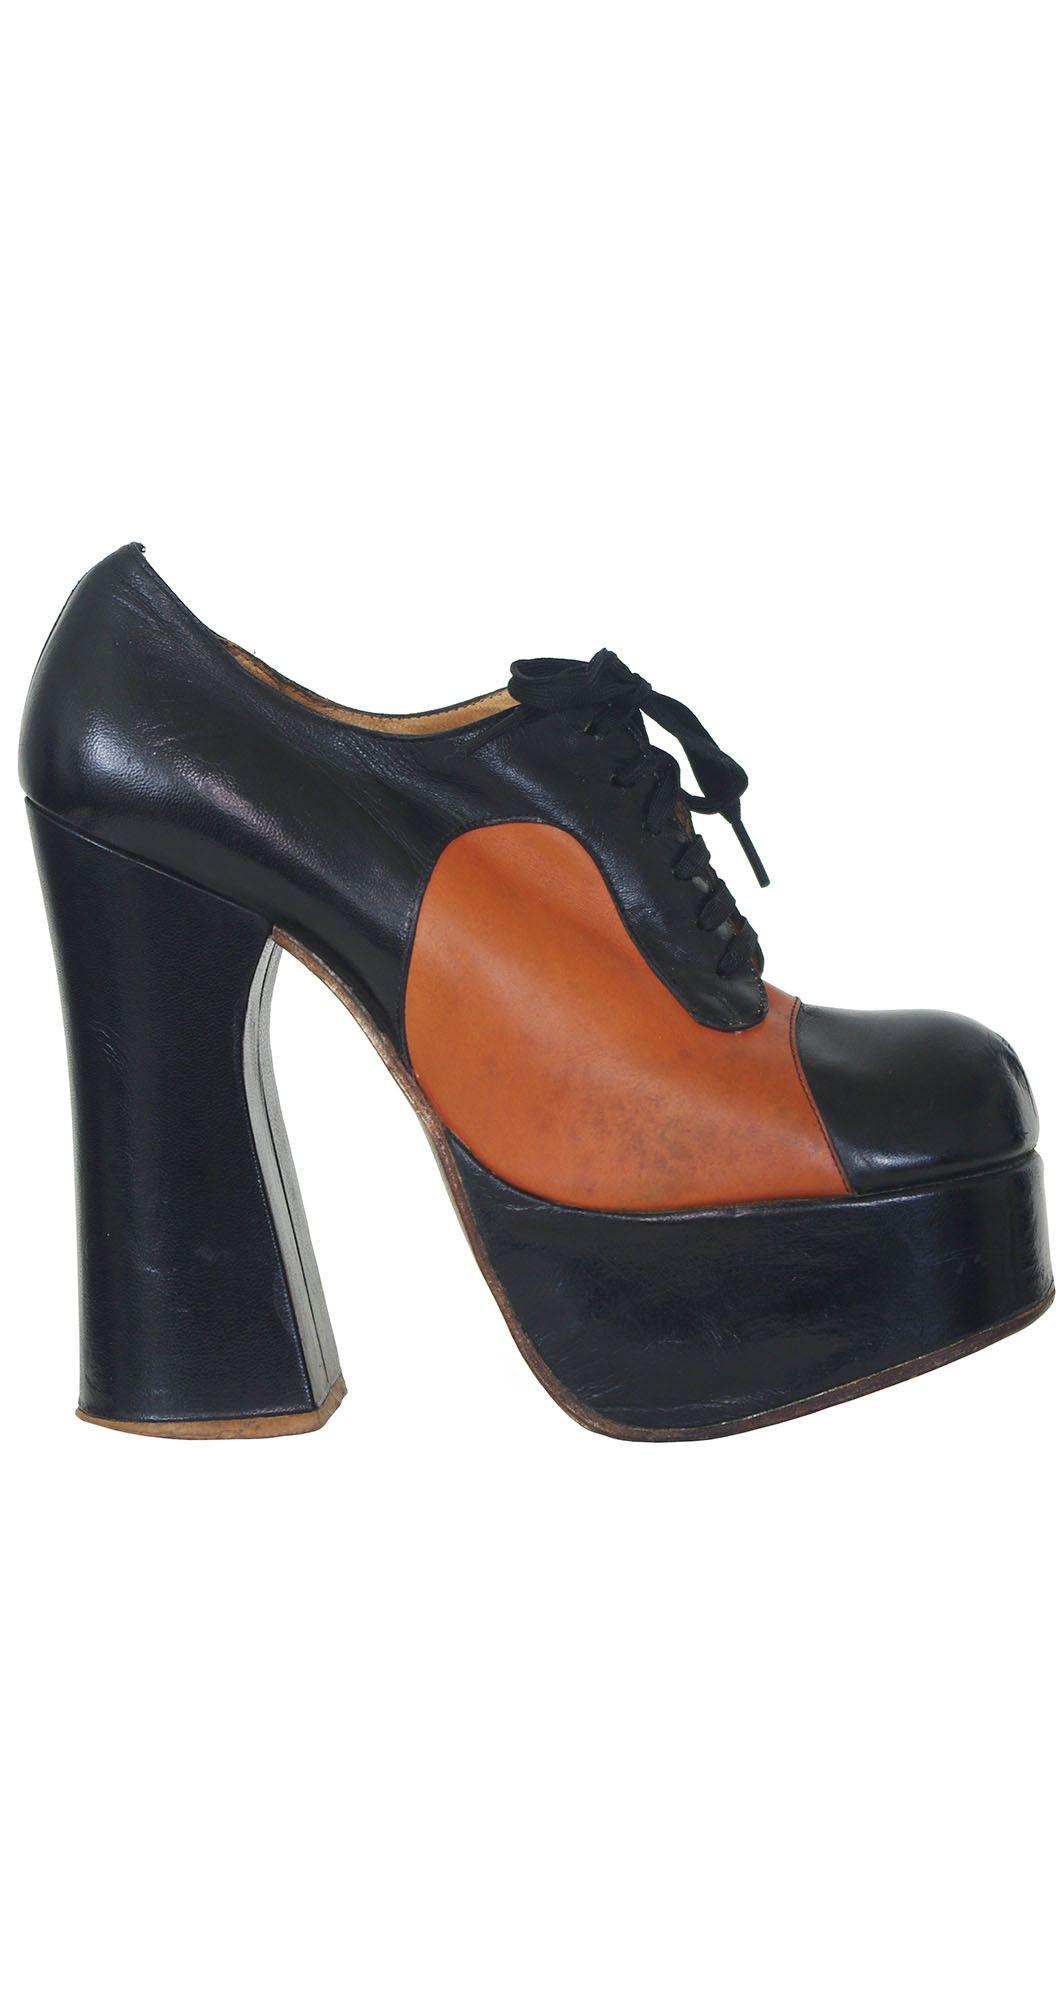 purchase cheap d52fa 6de95 ... 1970 s Tony Iammatteo for Cristina Black Brown Monster Platform Shoes.  Available on Featherstone Vintage  Diadora Mondiale Soccer Boot ...